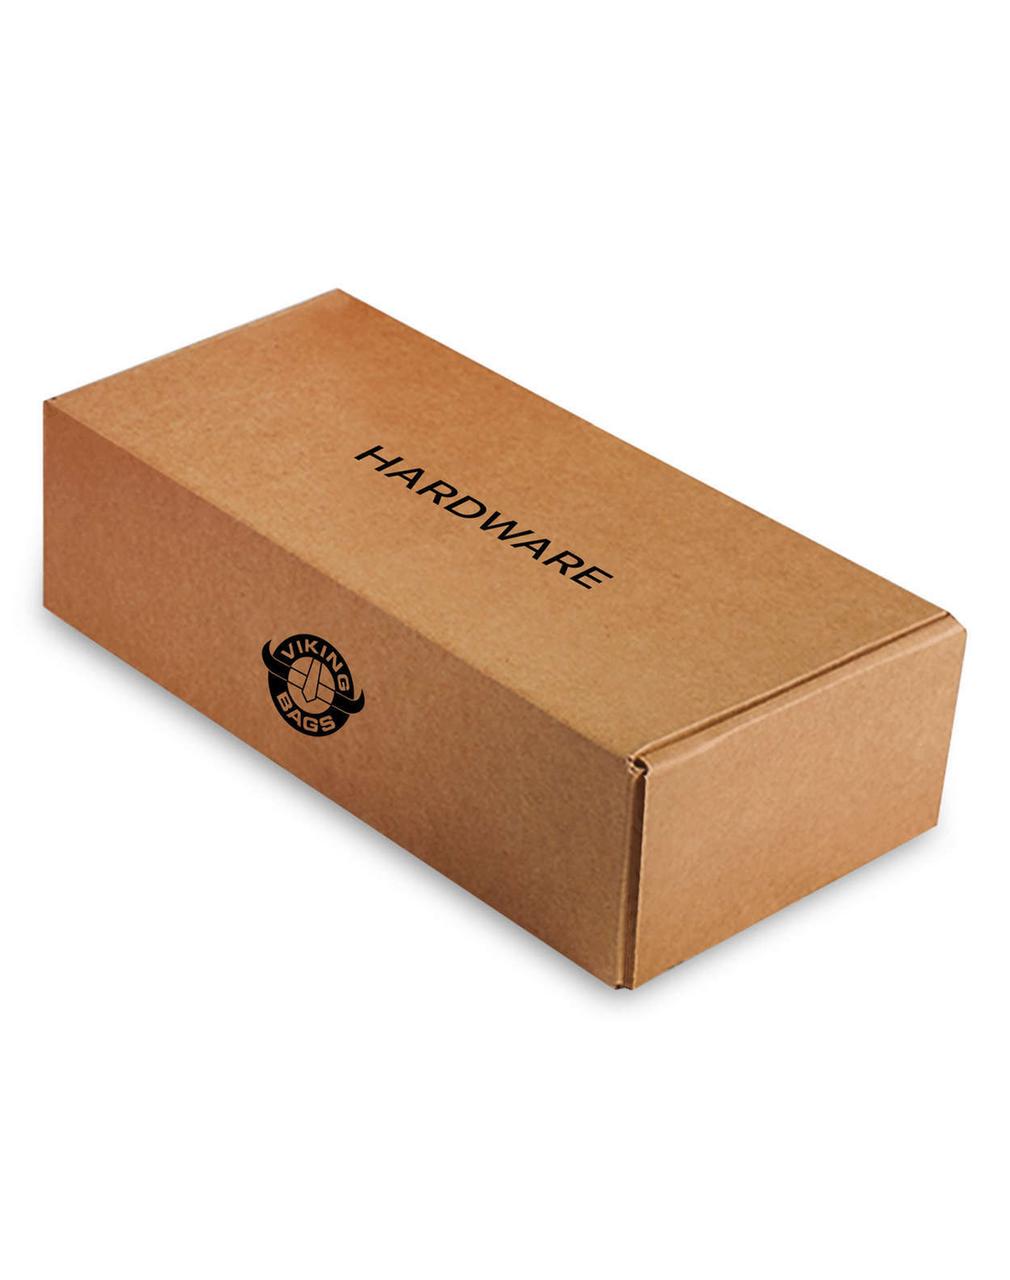 Honda VTX 1800 R Viking Odin Medium Motorcycle Saddlebags Hardware Box